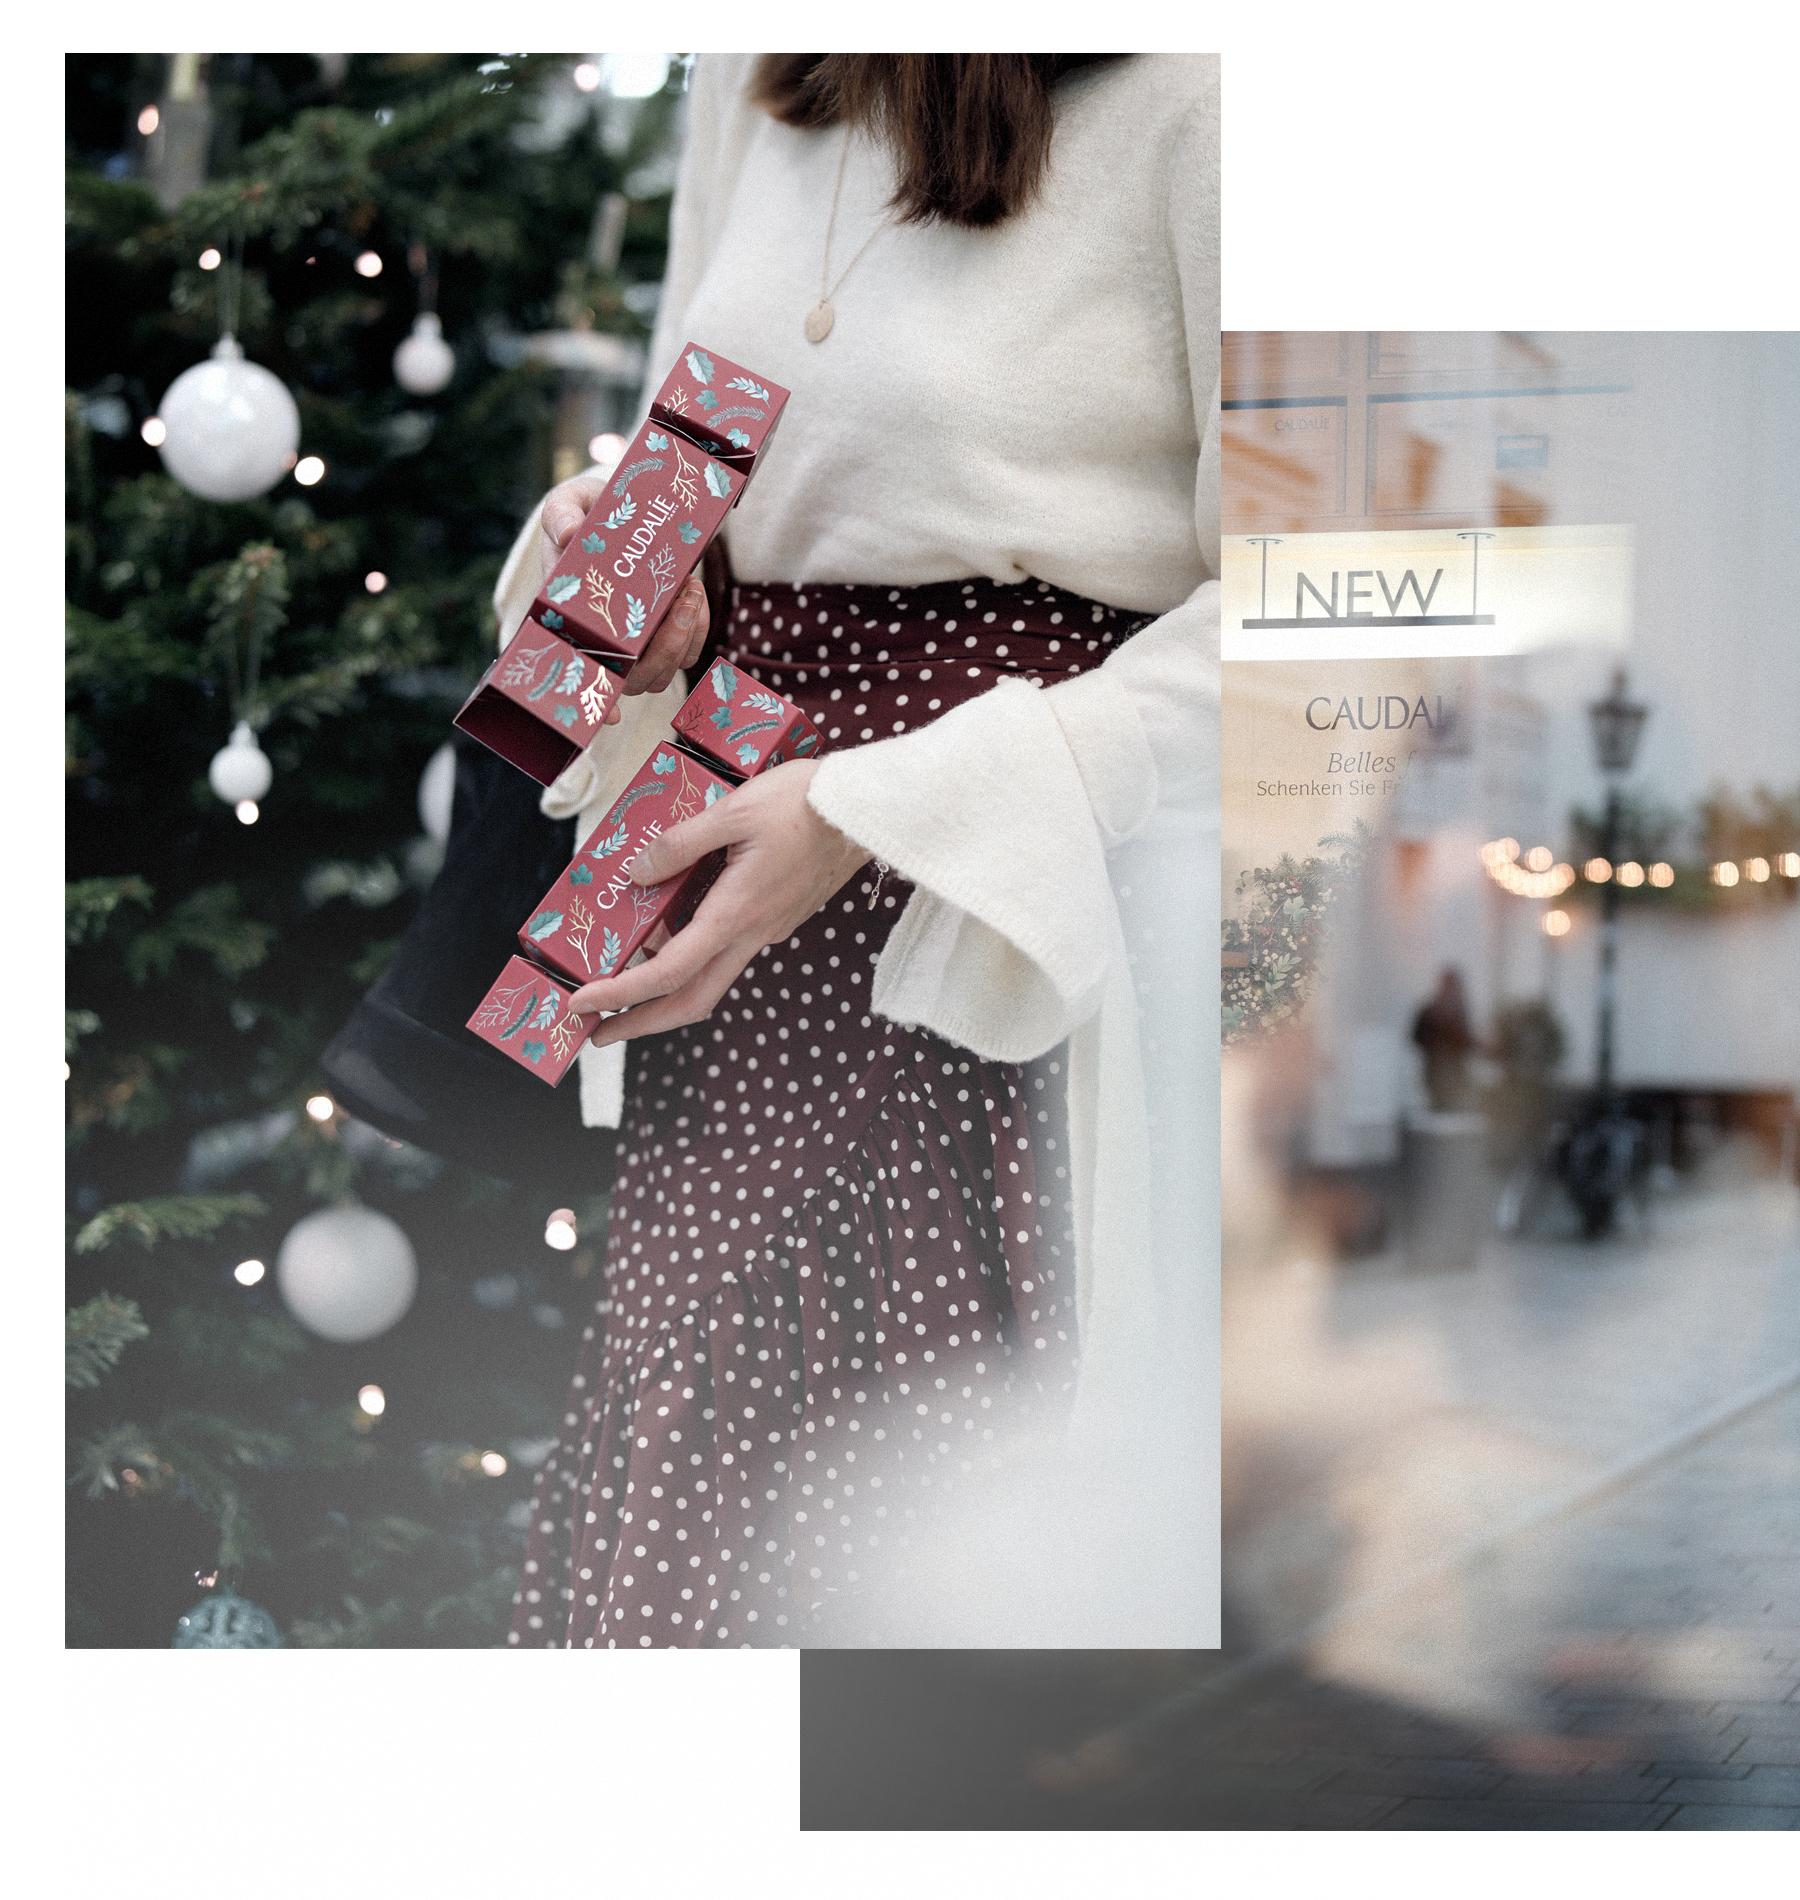 caudalie christmas boutique spa düsseldorf bordeaux france beauty beauté ricarda schernus xmas holidays gewinnspiel win snow lights wiehundundkatze catsanddogsblog modeblog beautyblogger germany max bechmann fotografie film 2